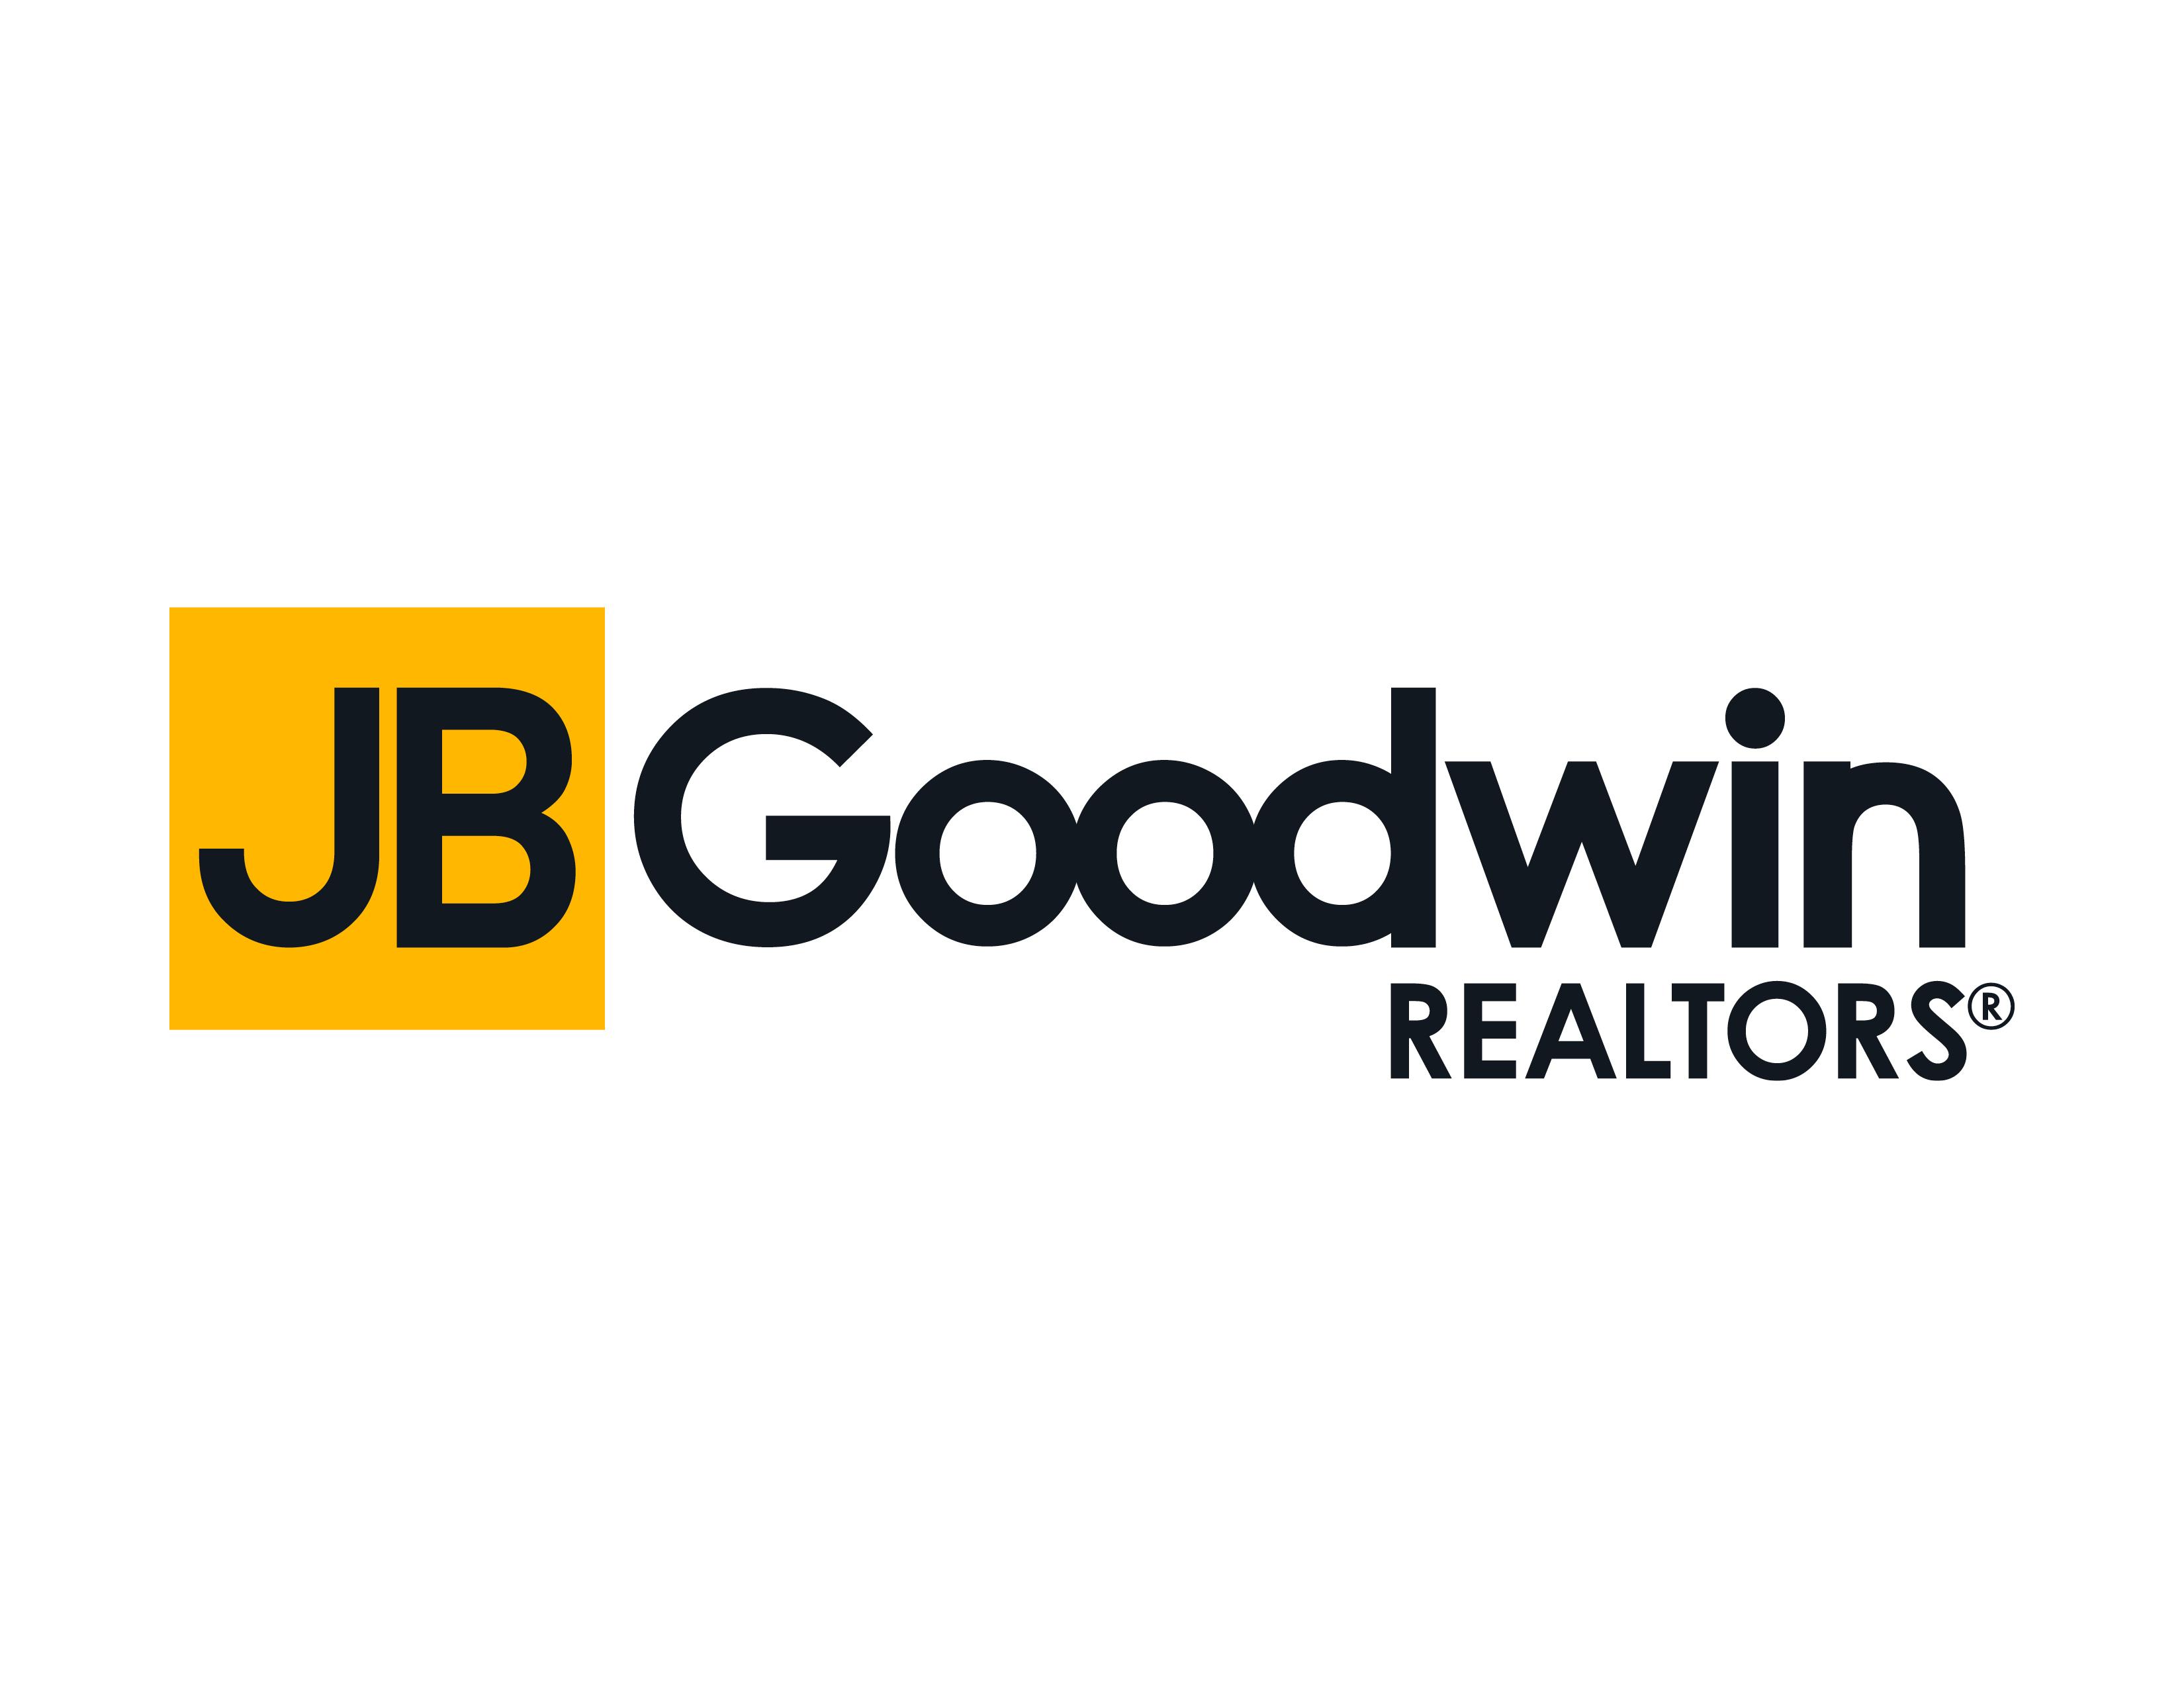 JBGoodwin REALTORS logo